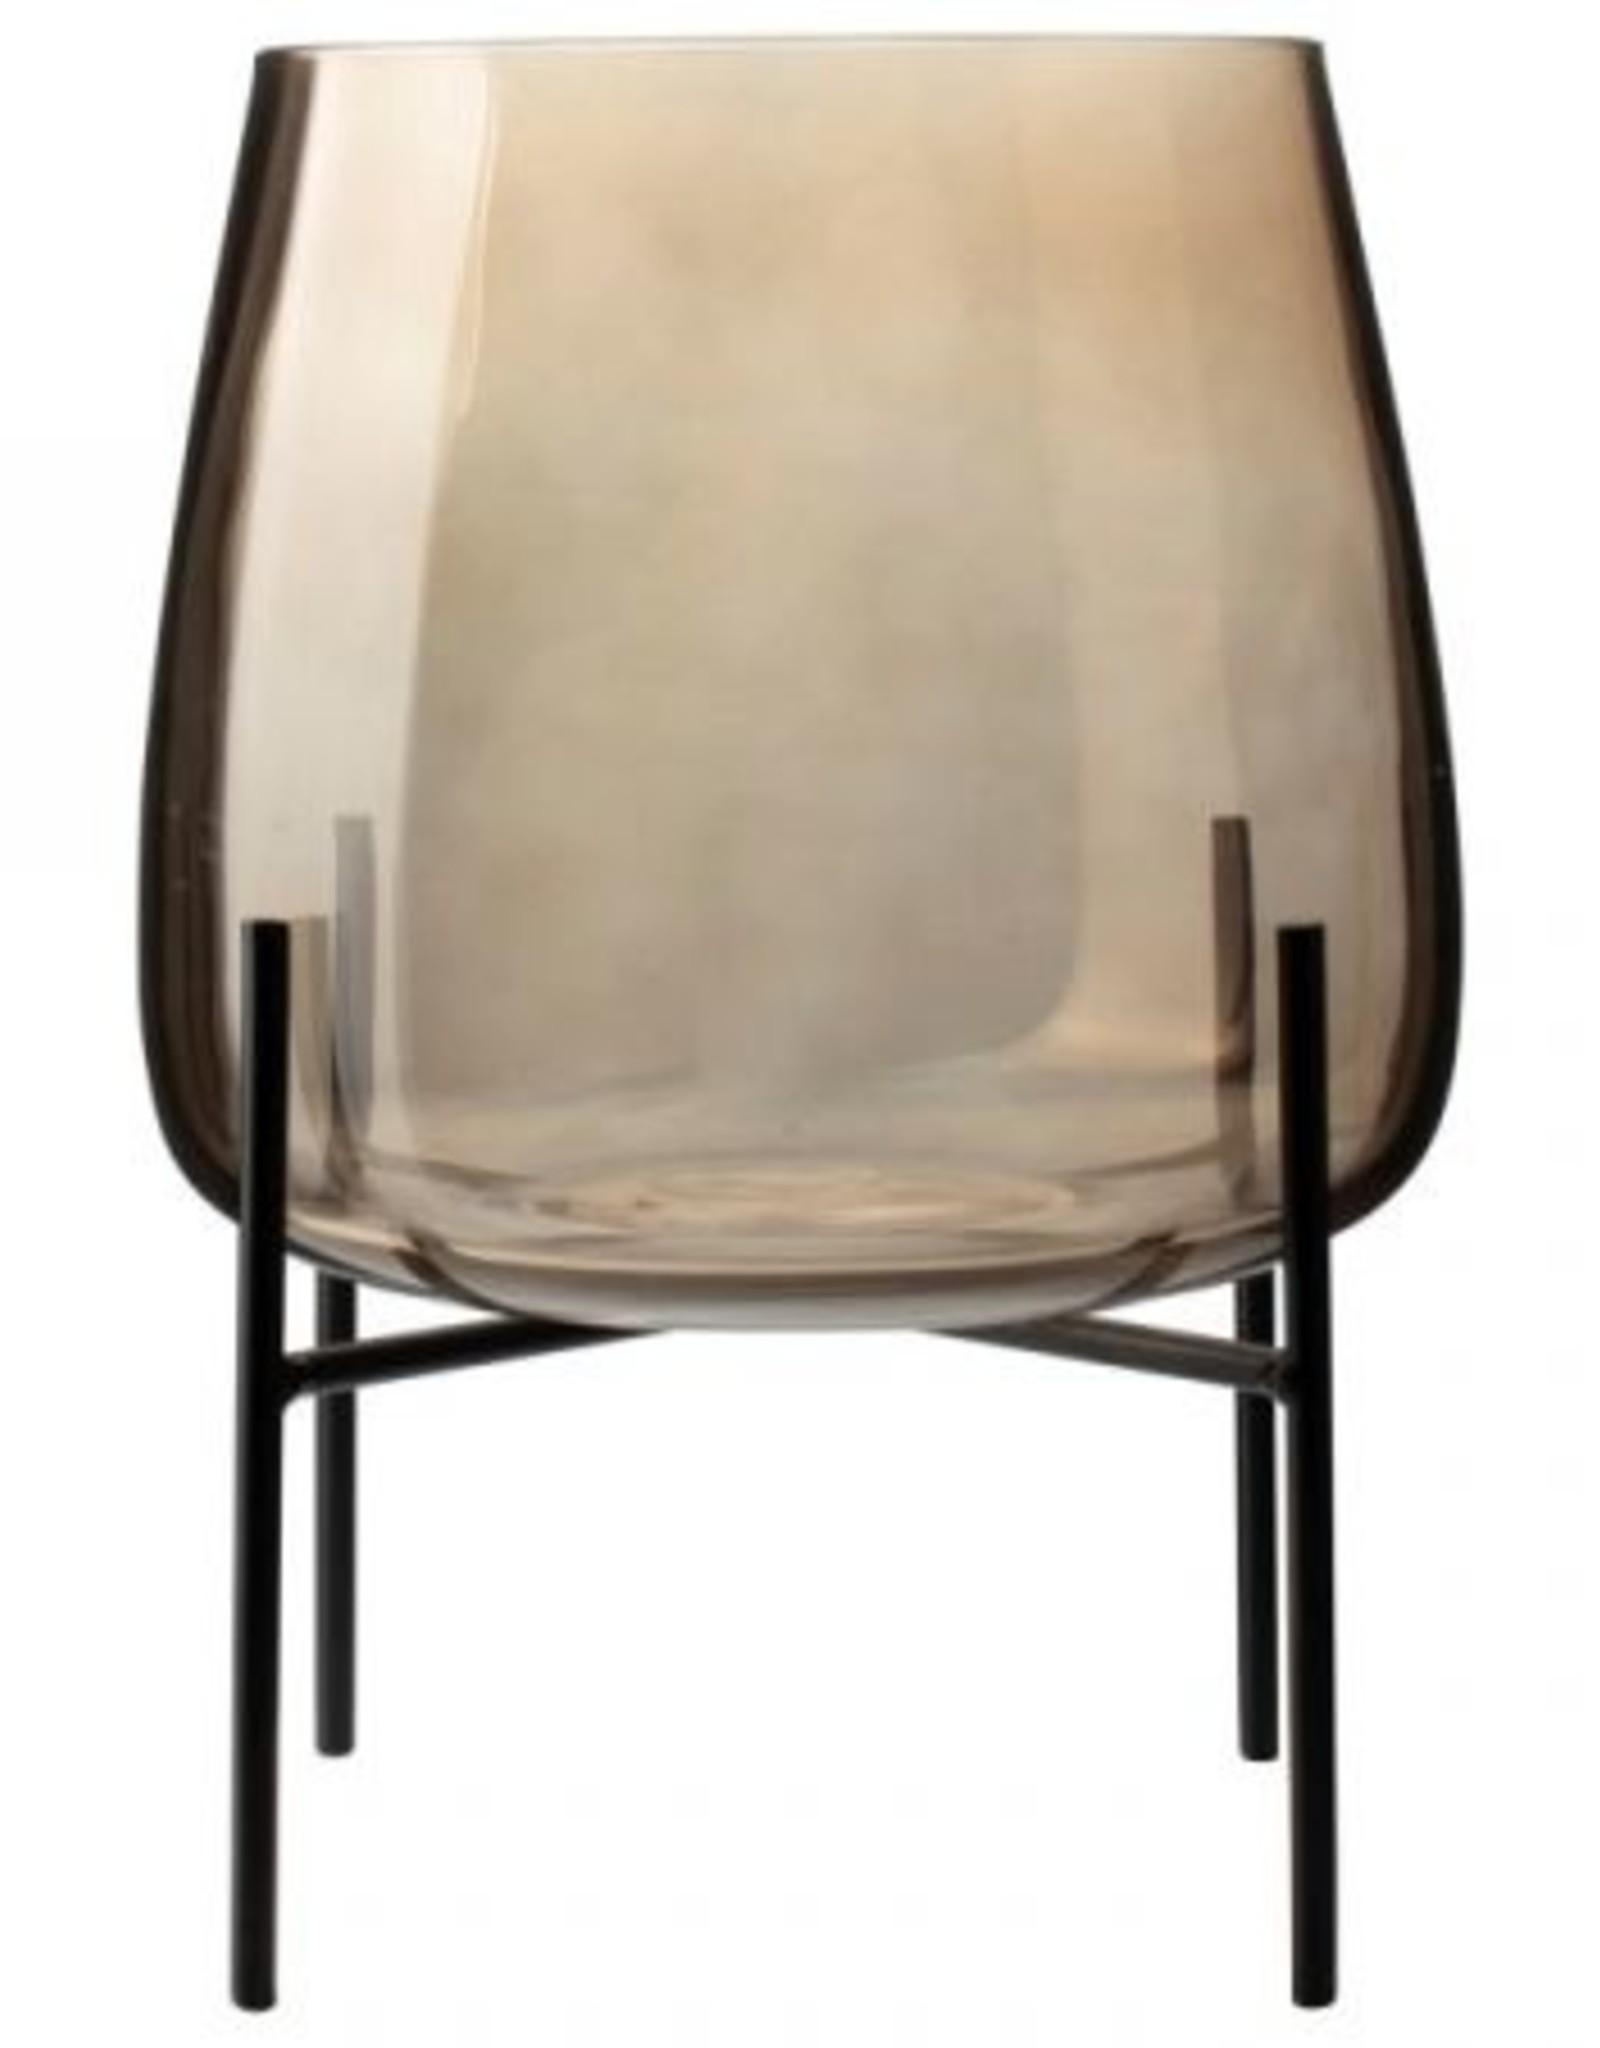 Gusta Glazen vaas op standaard | Gusta| 18 cm  |